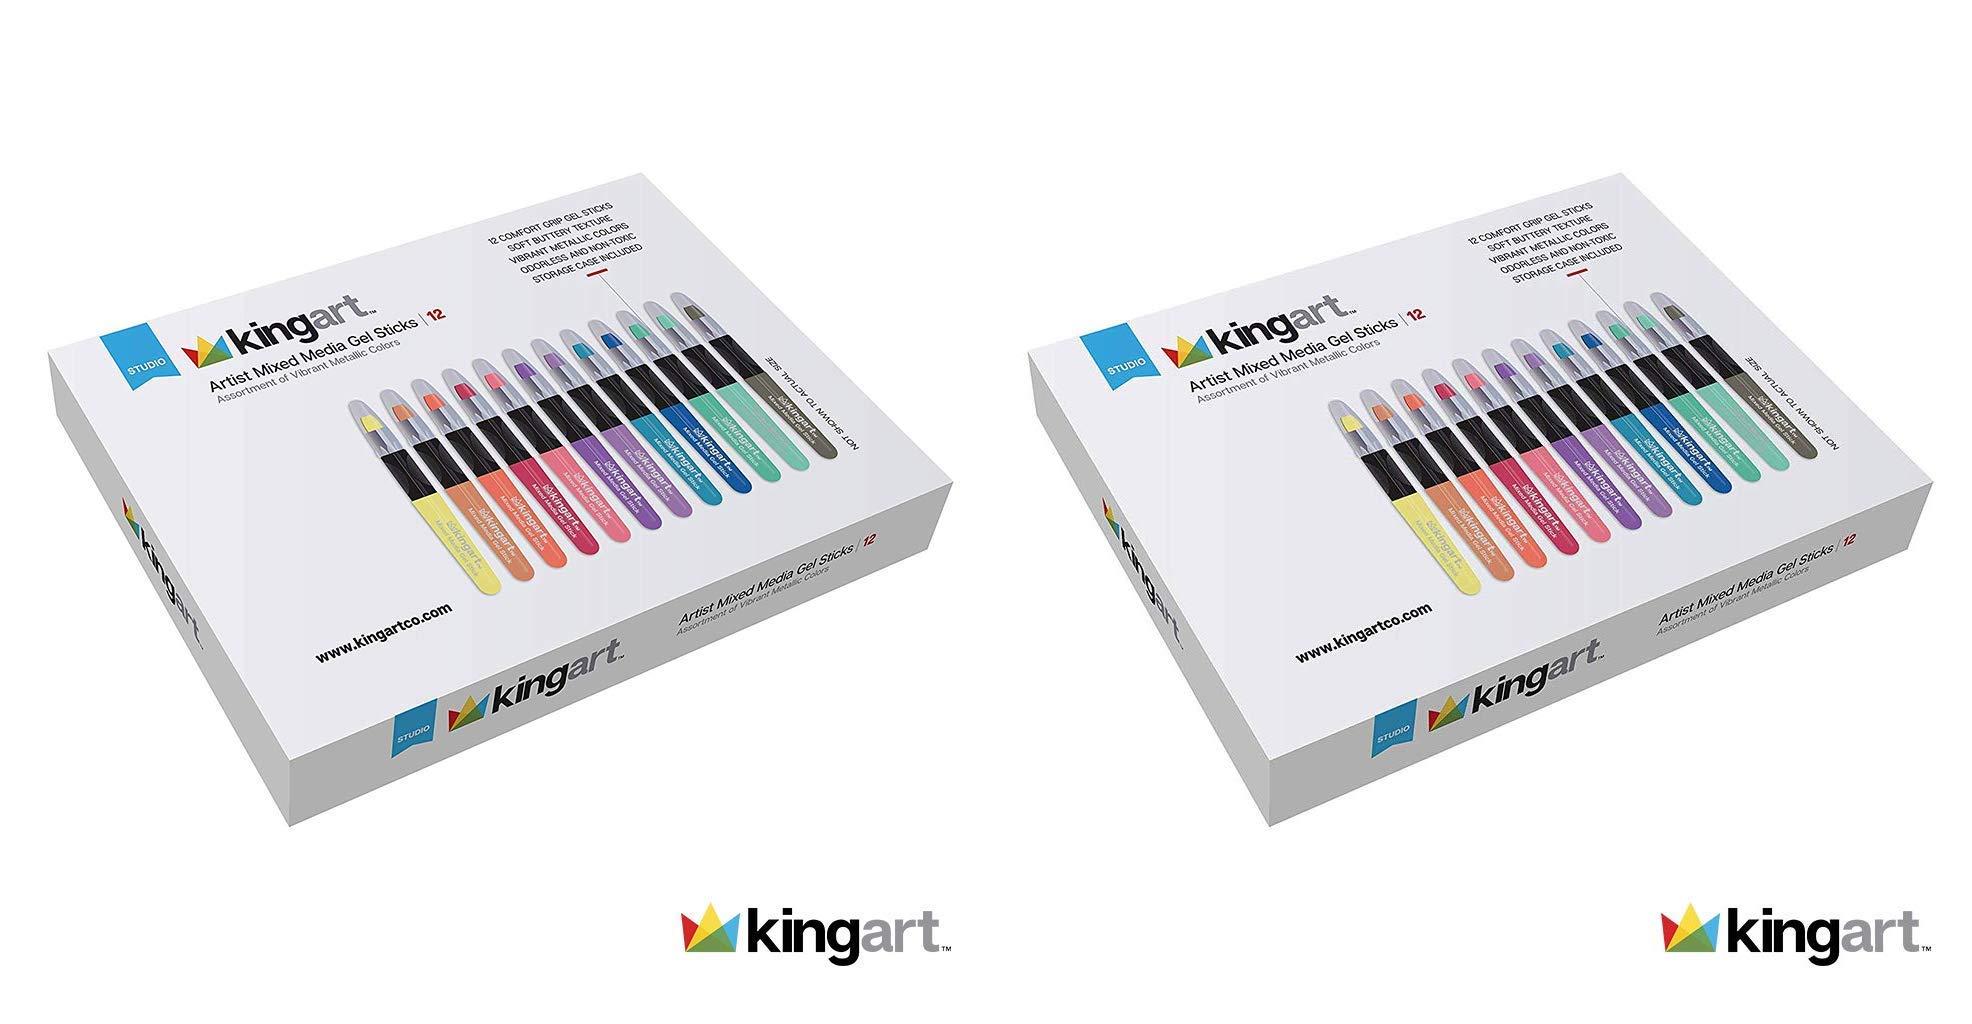 KINGART Metallic Artist Mixed Media Gel Sticks - Set of 12, Vivid Colors (Twо Pаck) by KINGART